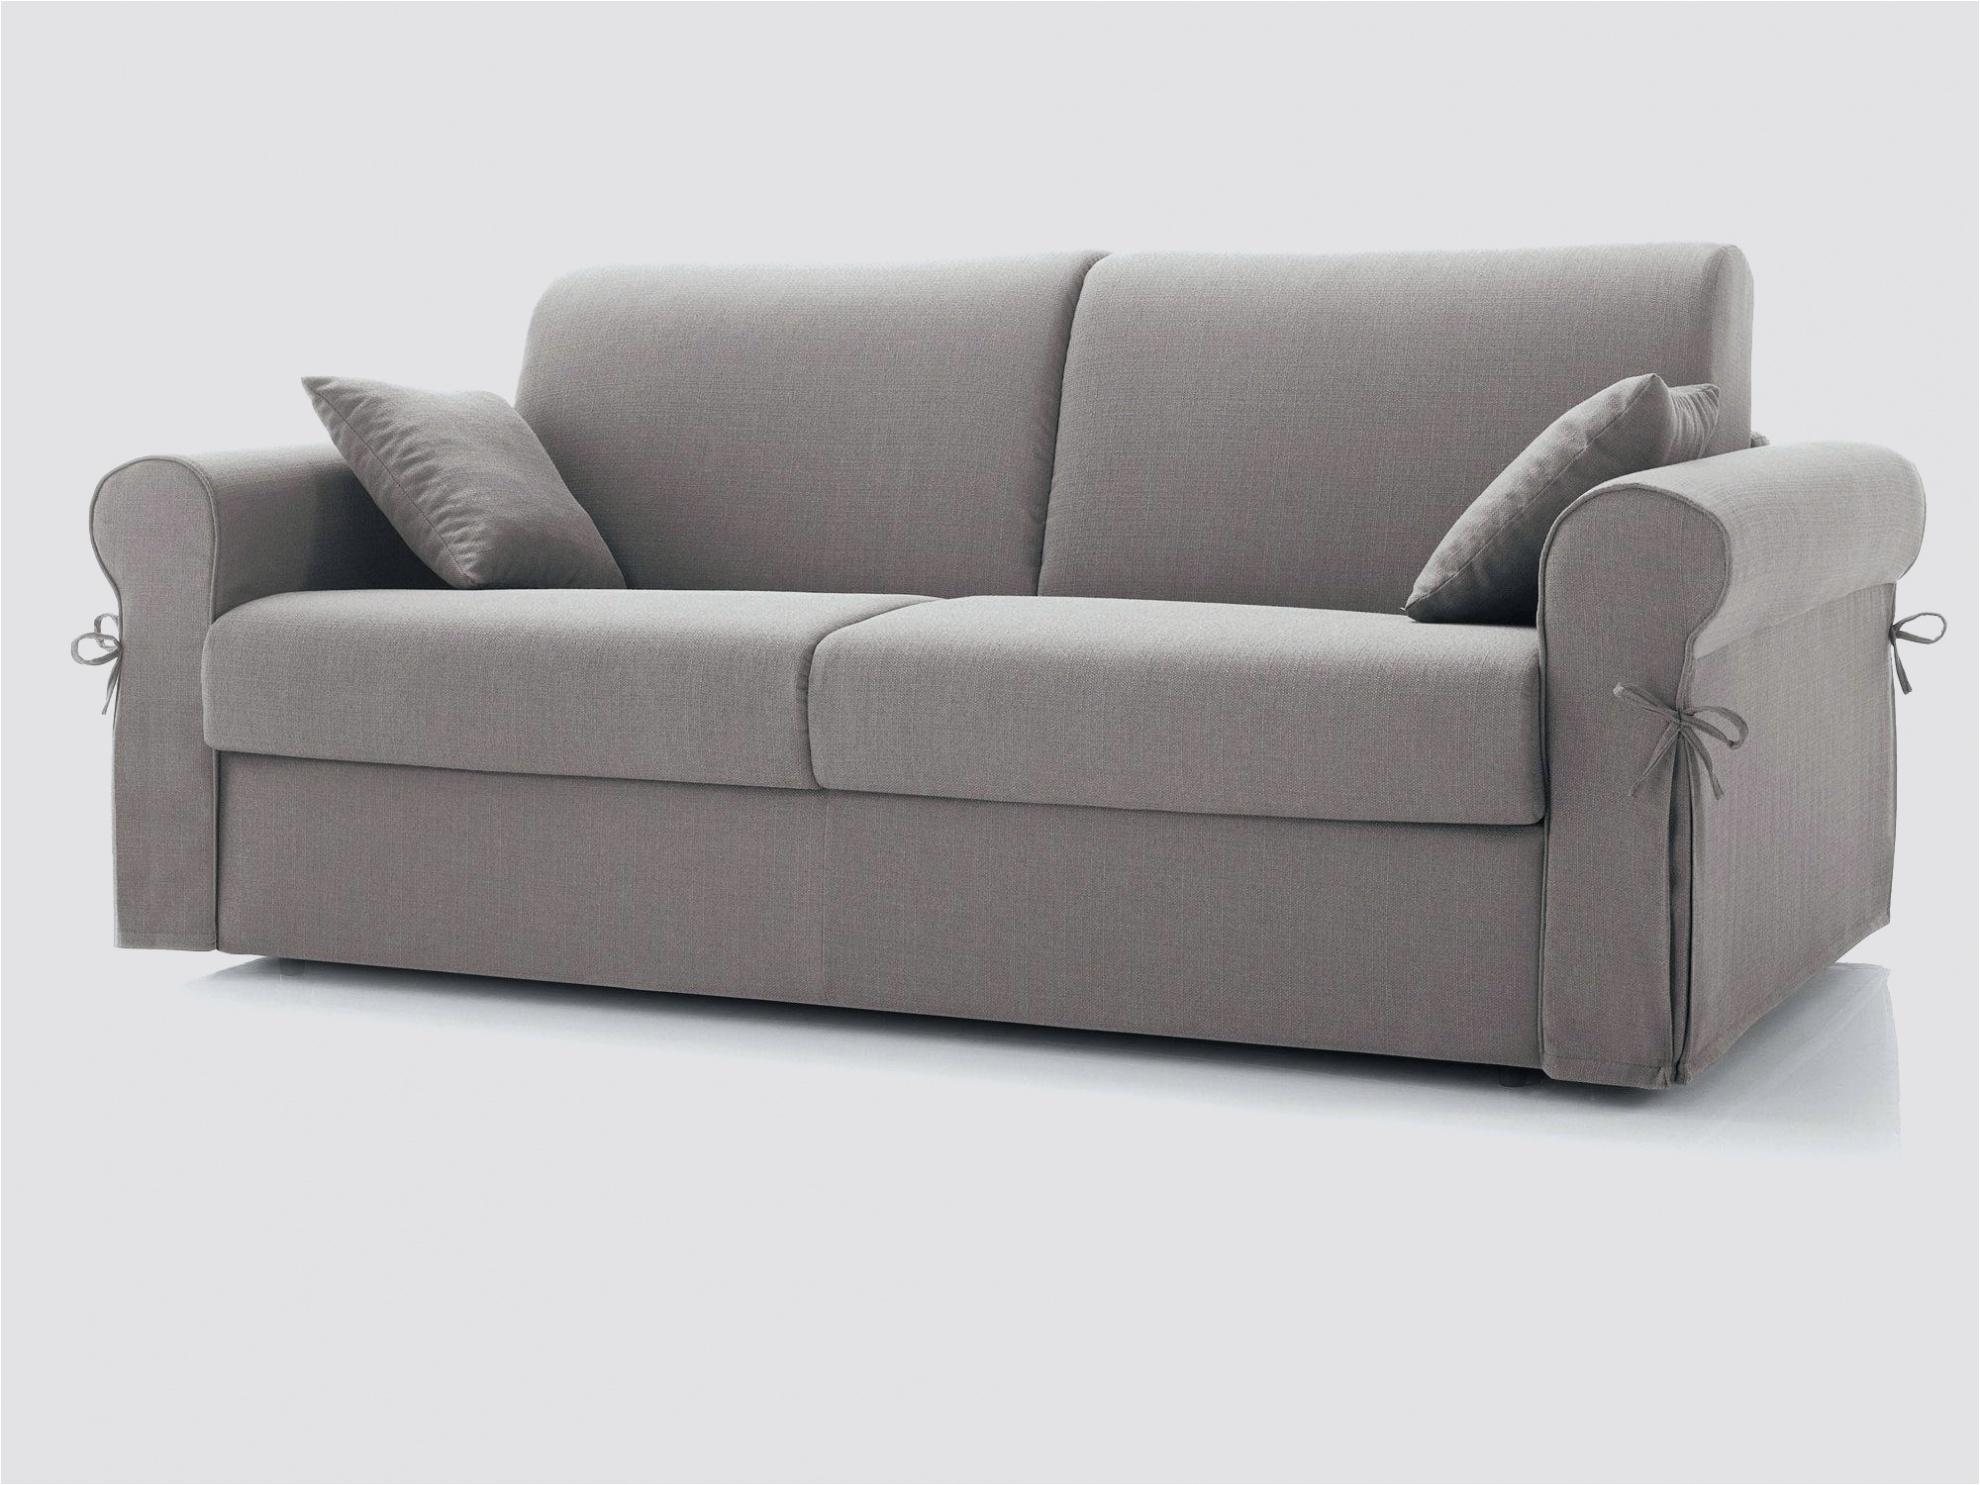 Canapé Friheten Ikea Beau Stock Maha S Canapé Fer forgé Thuis Mahagranda